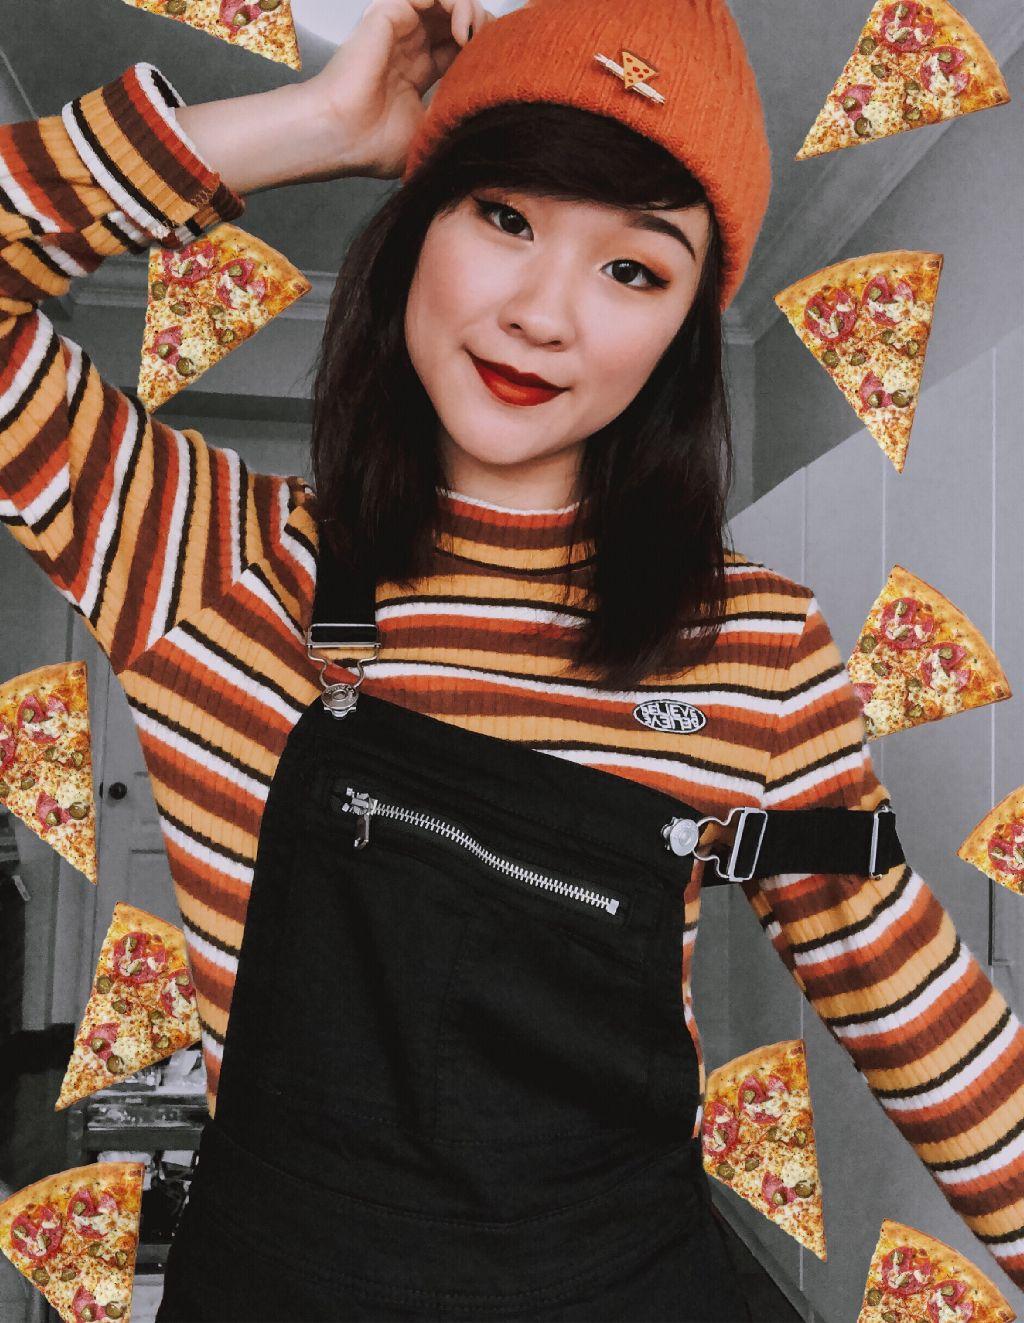 #freetoedit #pizza #party #orangeaesthetic